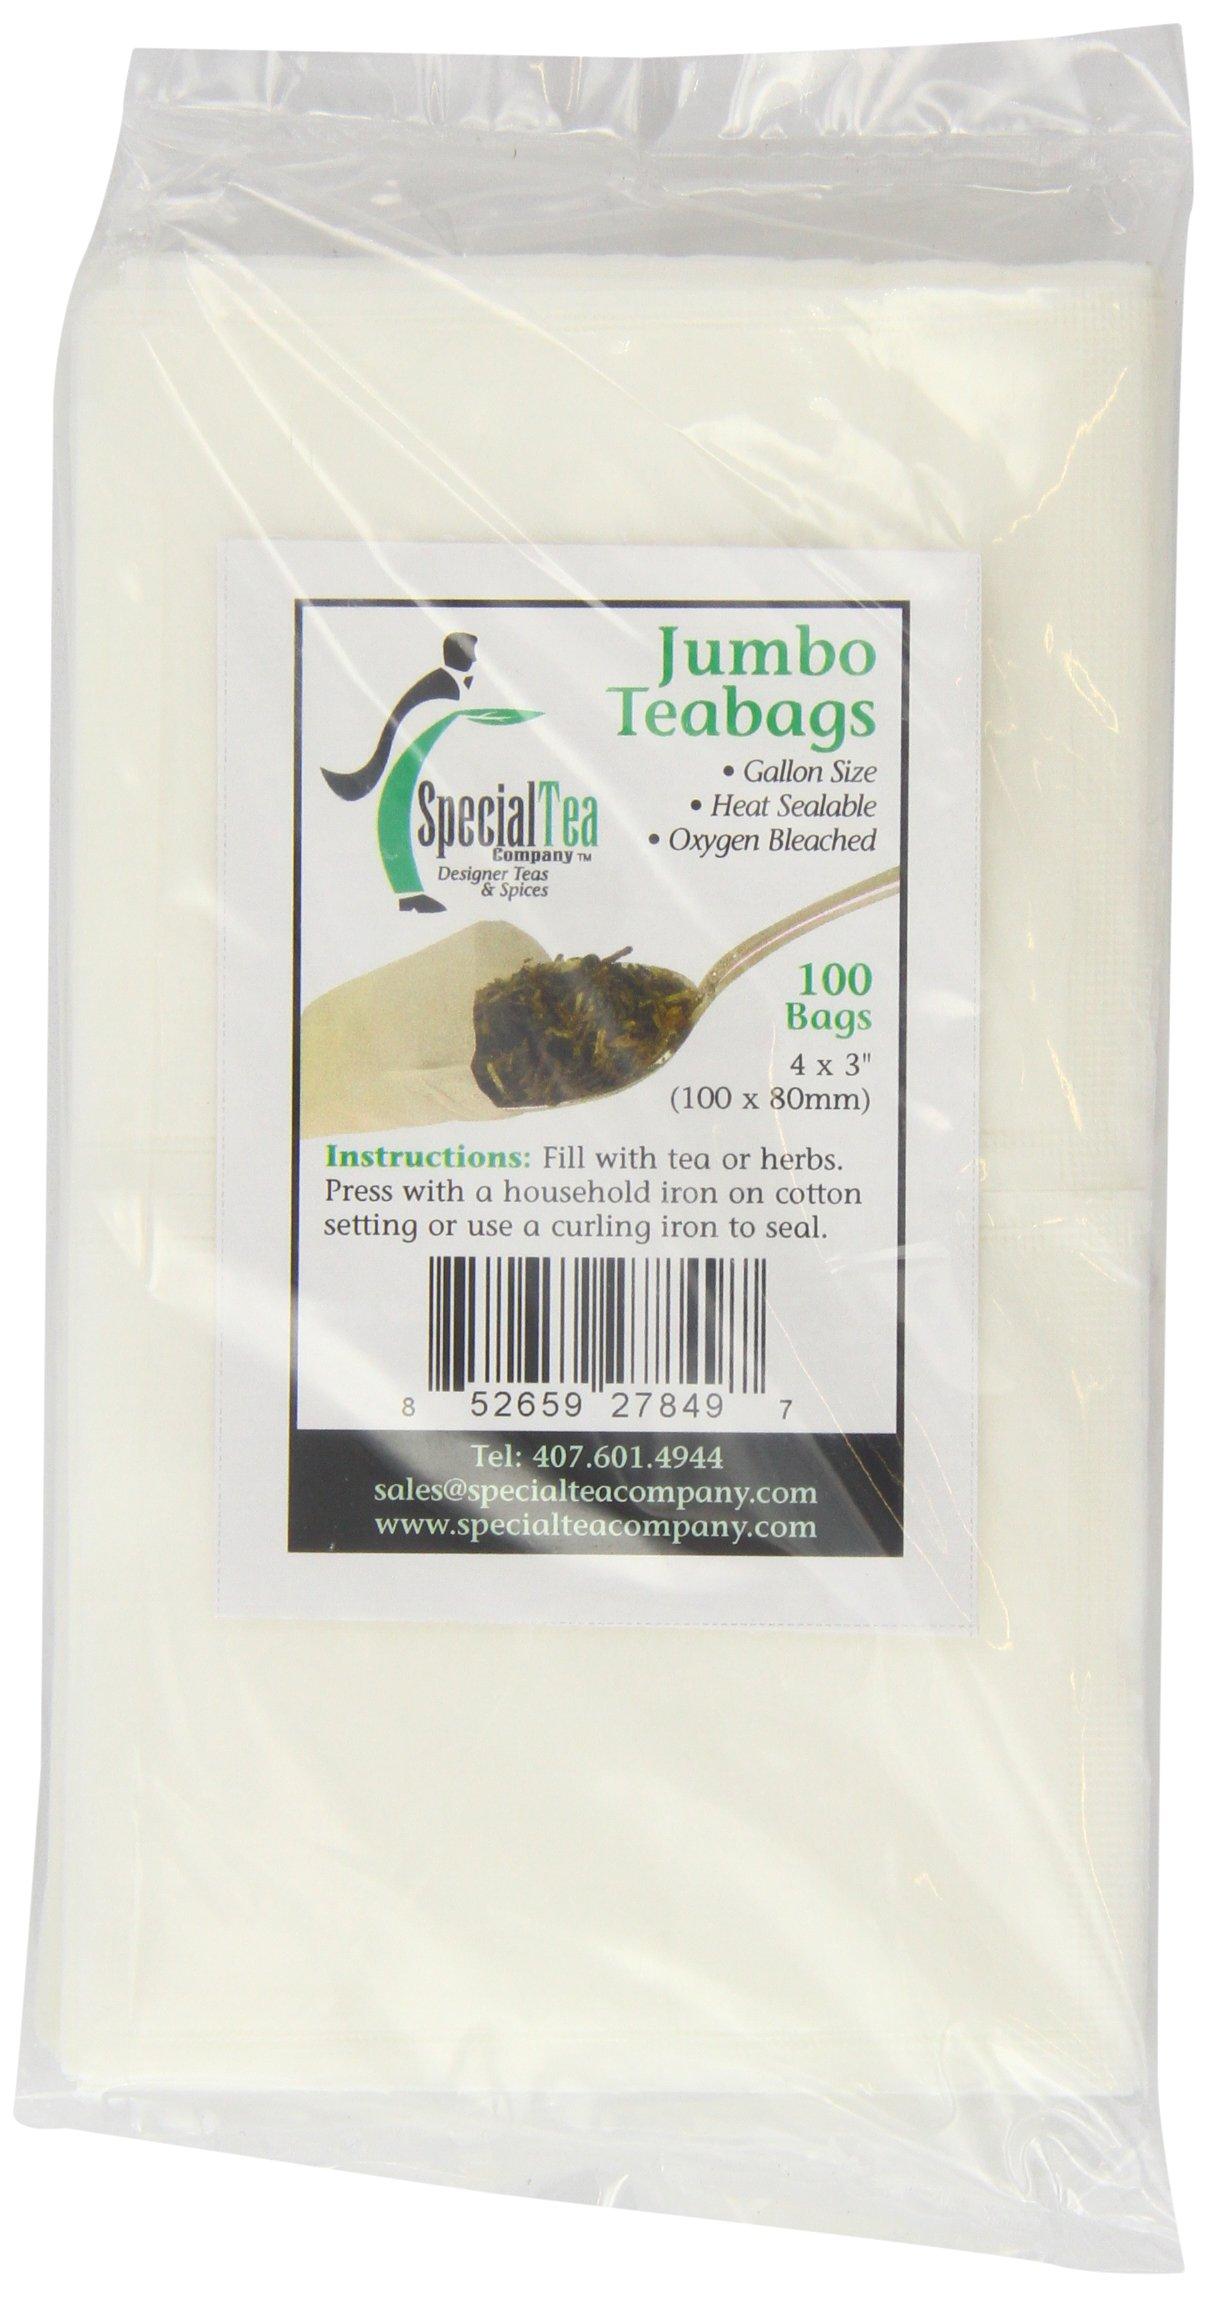 Special Tea Company 4 by 3-Inch 100-Piece Empty Tea/Herb Bags, Jumbo